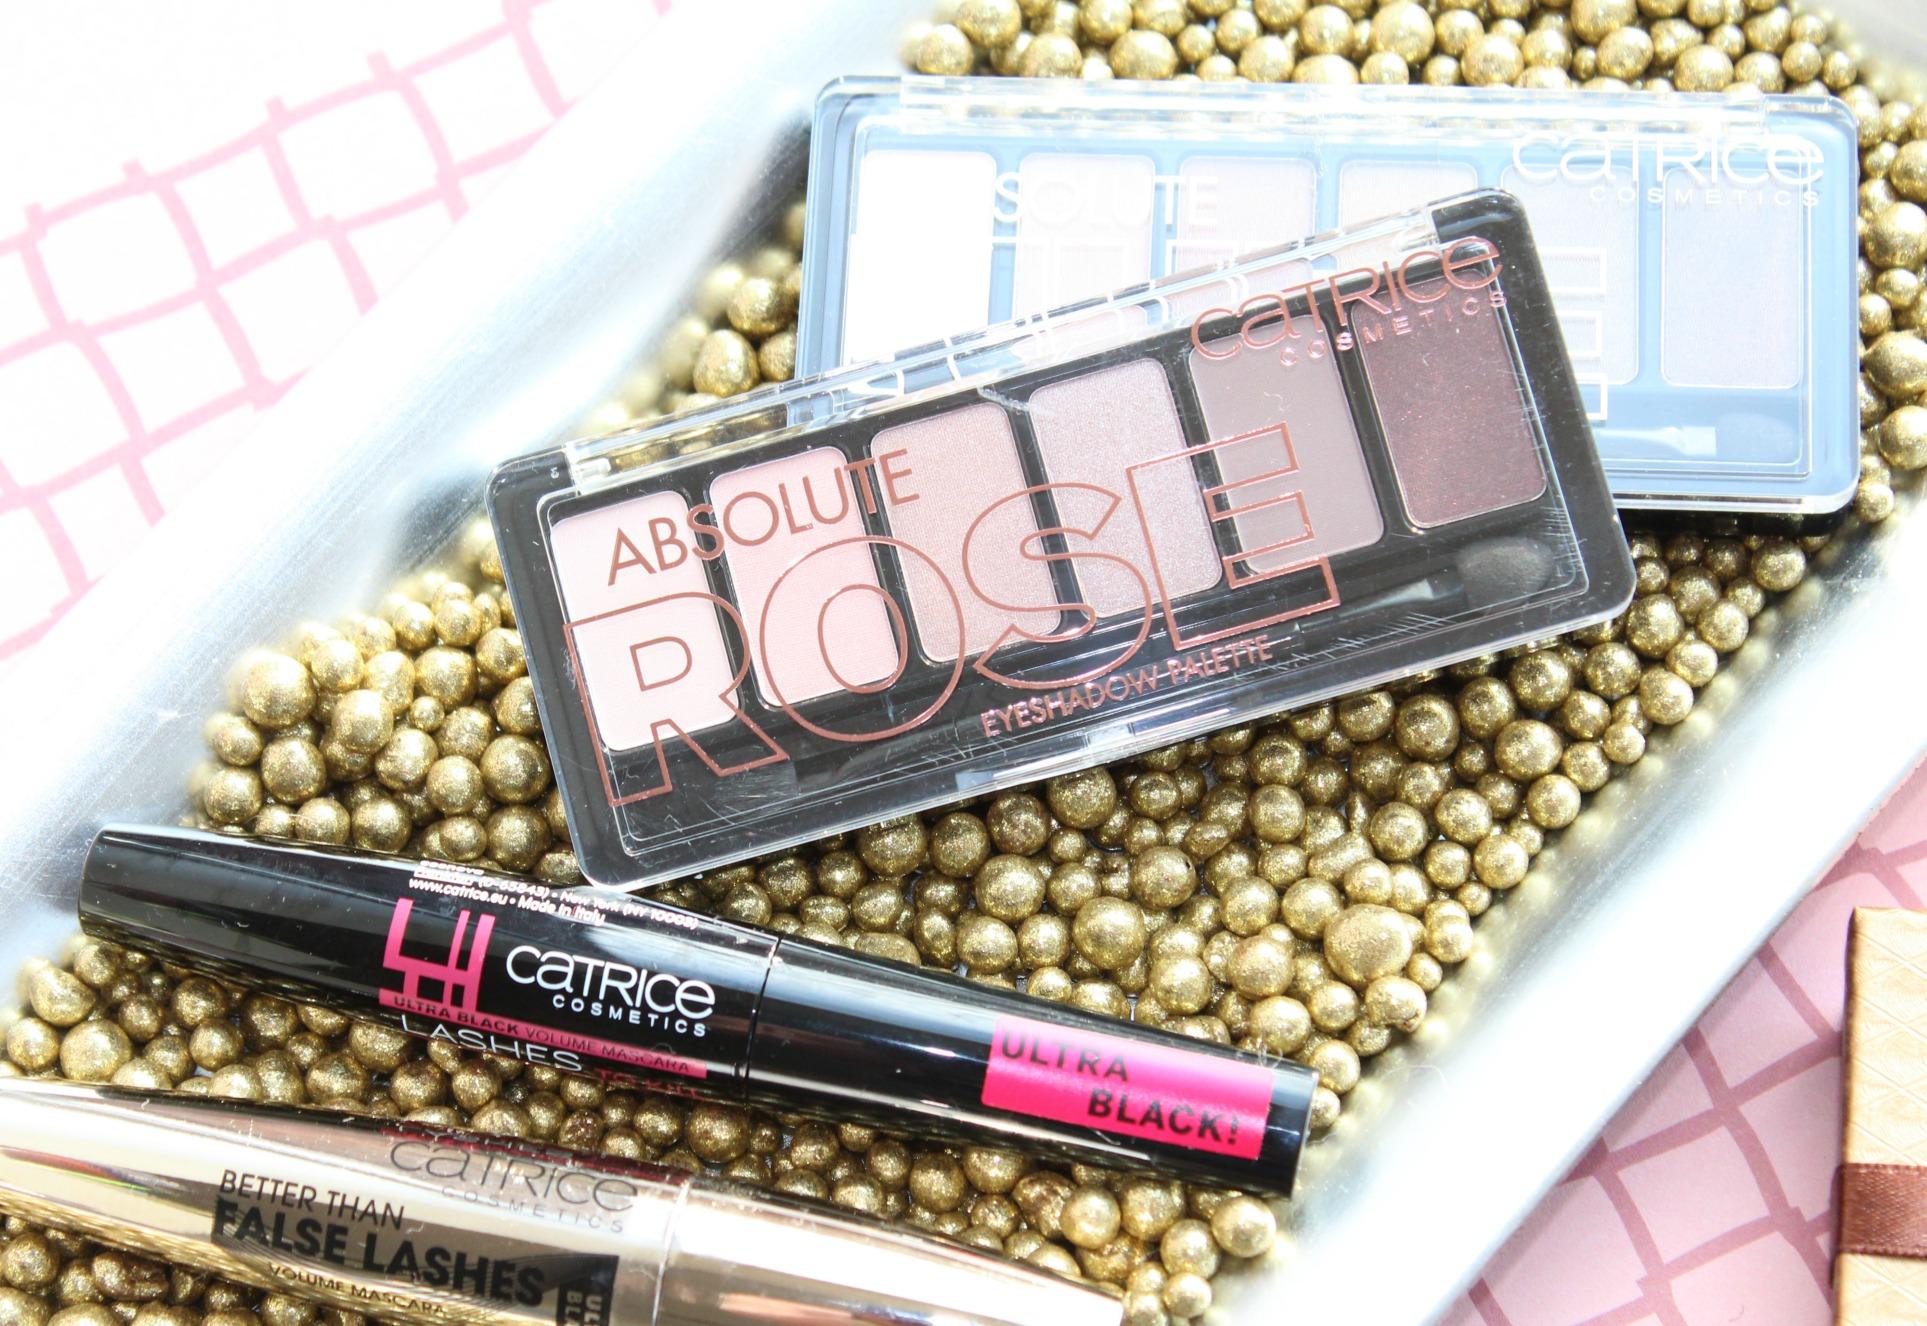 Mini Beaty shoplog-GoodGirlsCompany-Catrice-Body Shop-Garnier Loving Blends